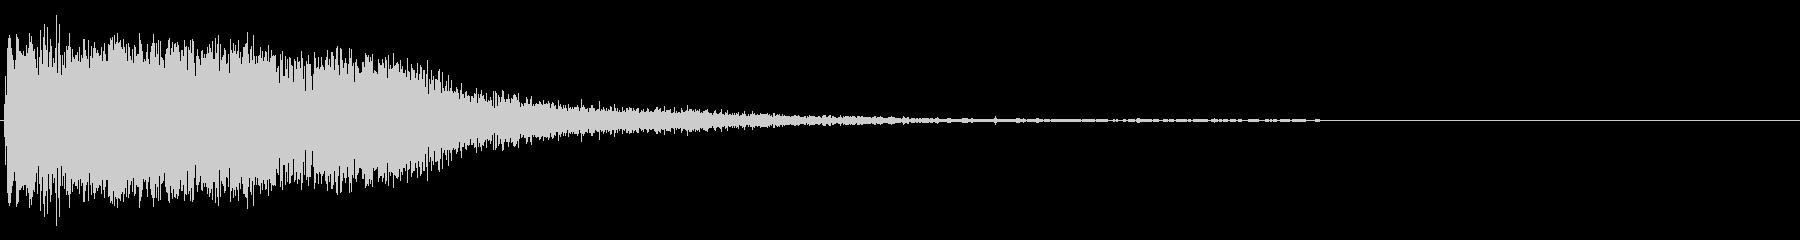 THOMPSON / CENTER...の未再生の波形